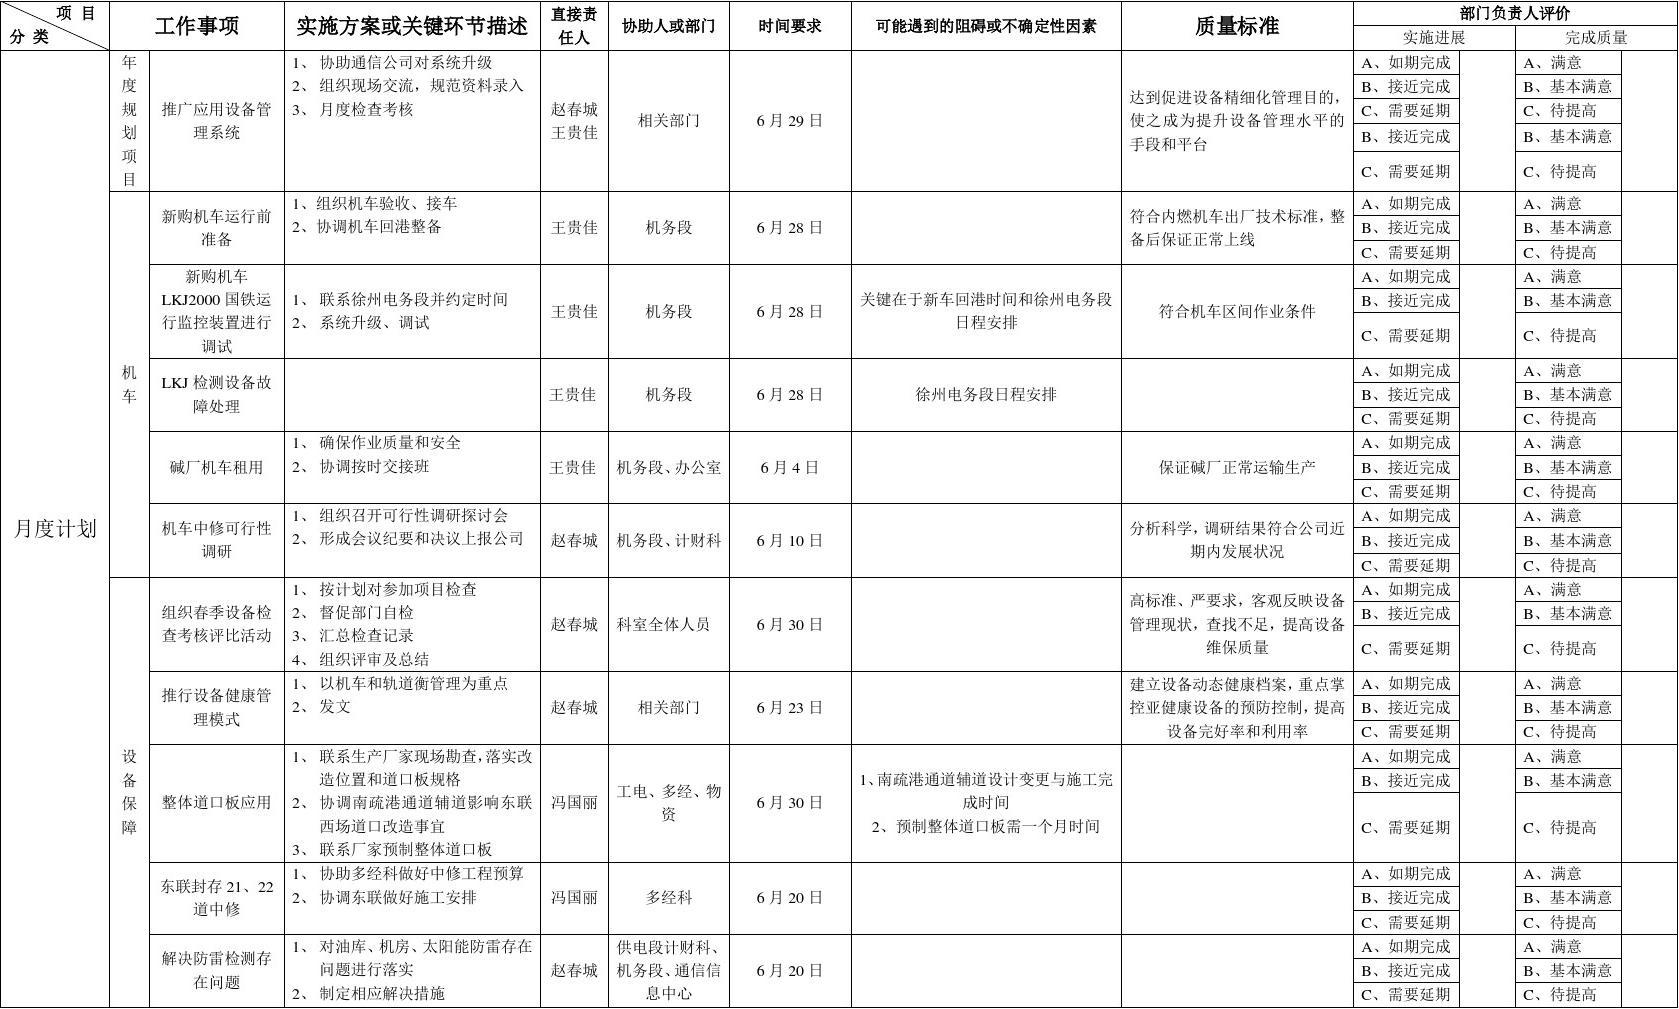 ktl[基础科学]技术科6月份工作计划明细表精品合集